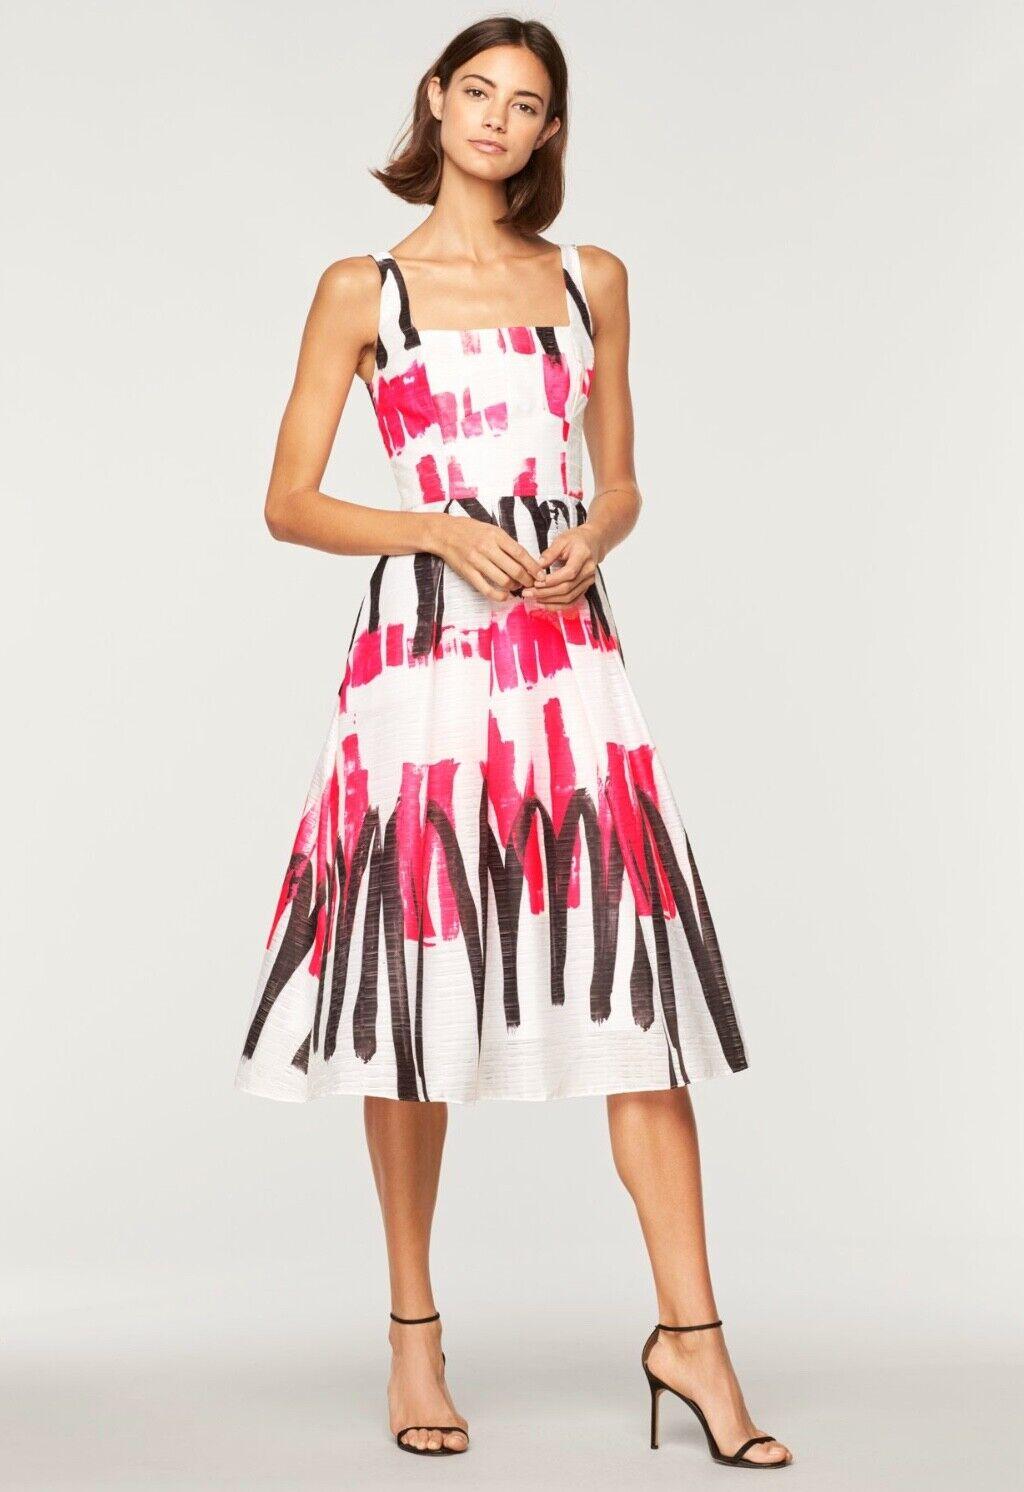 NWT Milly Modern Scribble Print Camilla Dress Storlek 6 ORIGINAL  675 Herregud